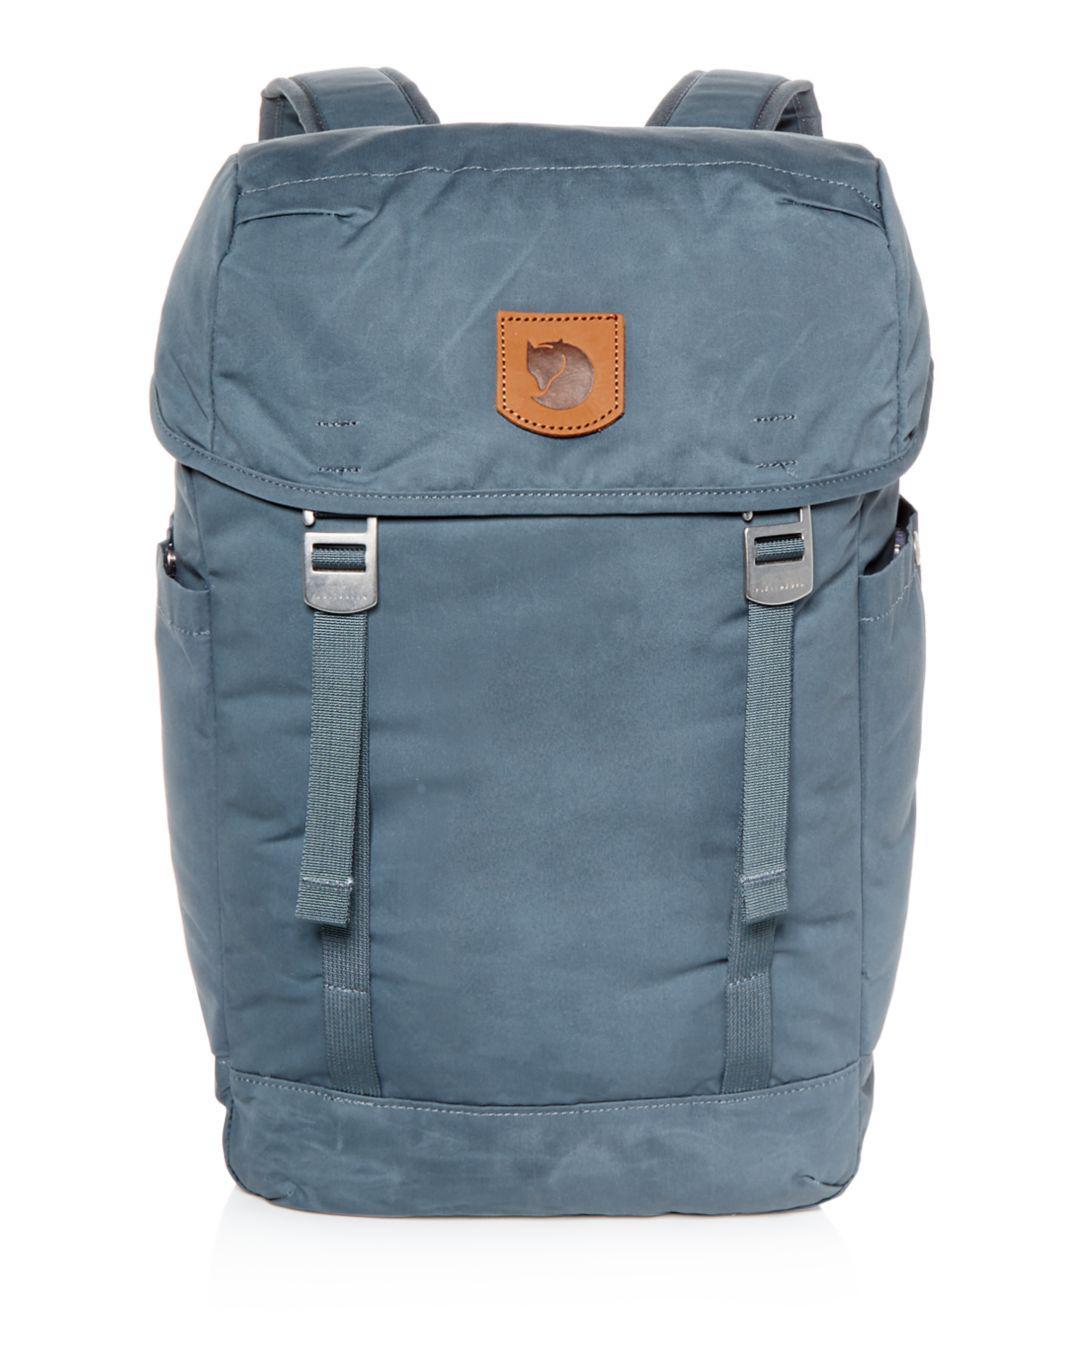 0d4e09d6f65 Fjallraven Greenland Top Backpack in Blue for Men - Lyst